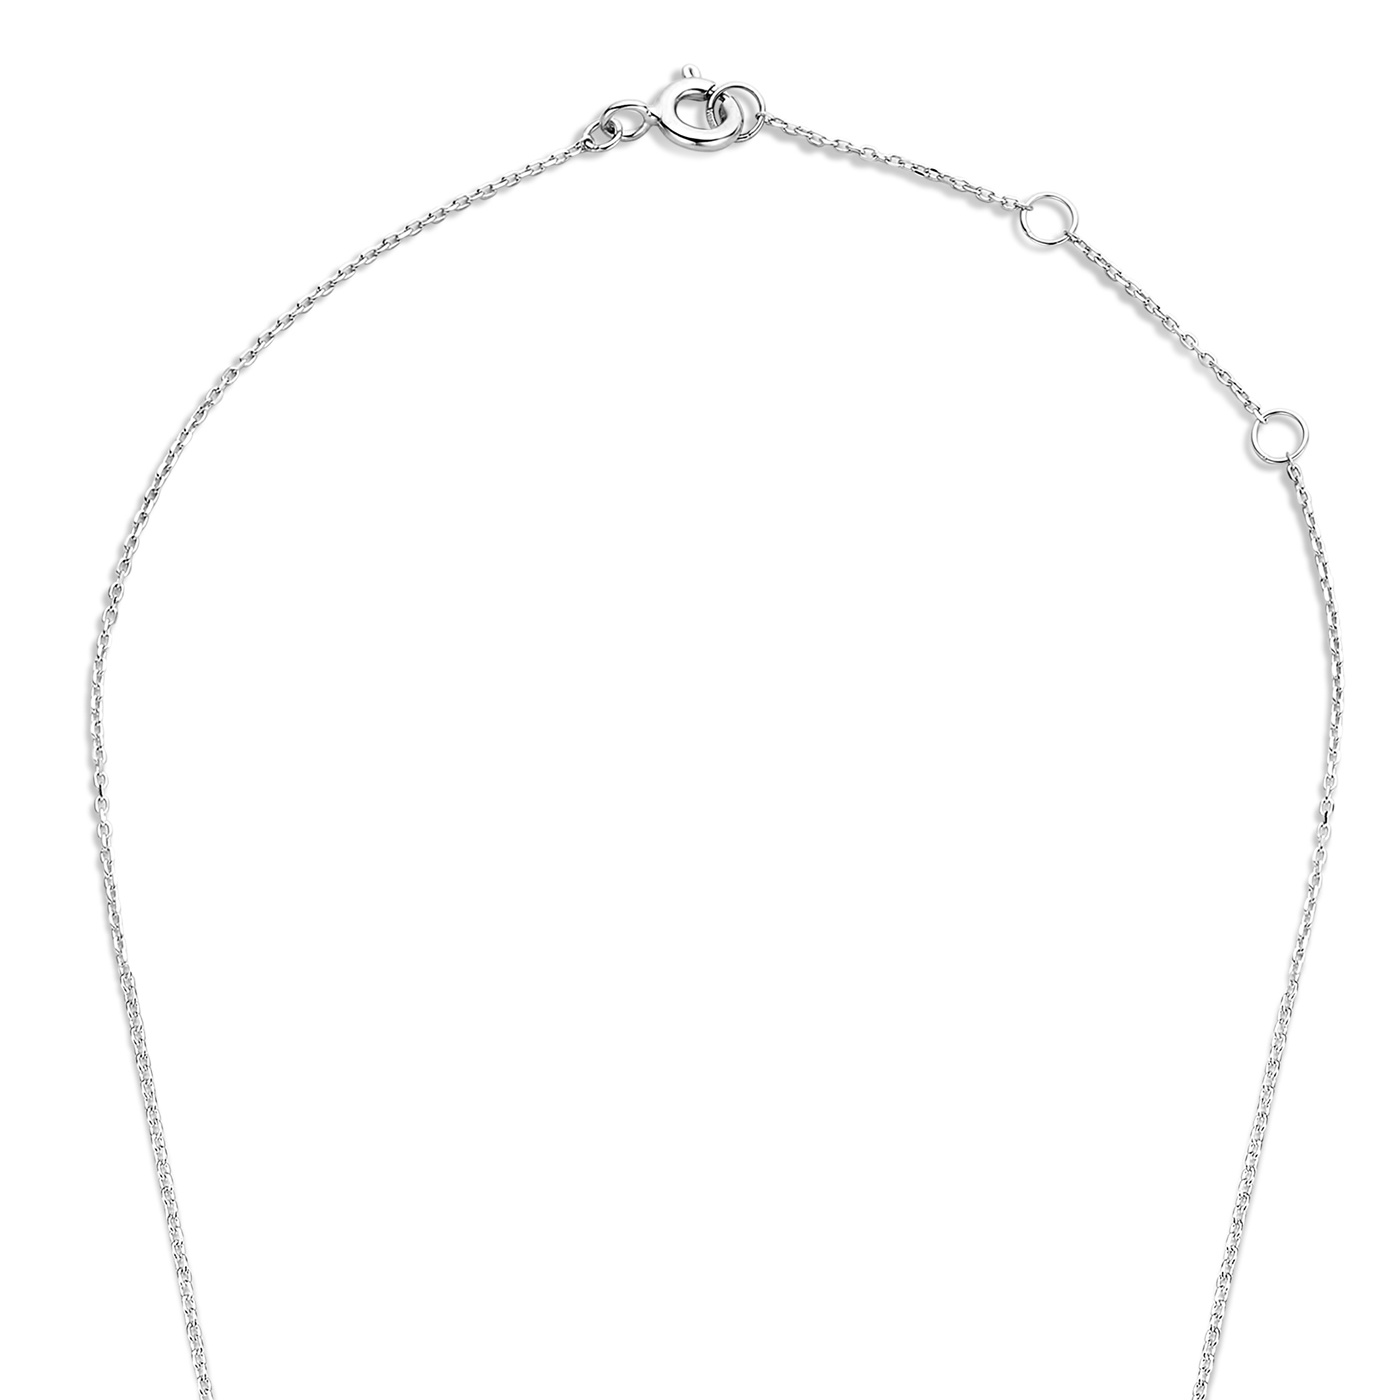 Isabel Bernard Saint Germain Hélione 14 karat vitt guldhalsband